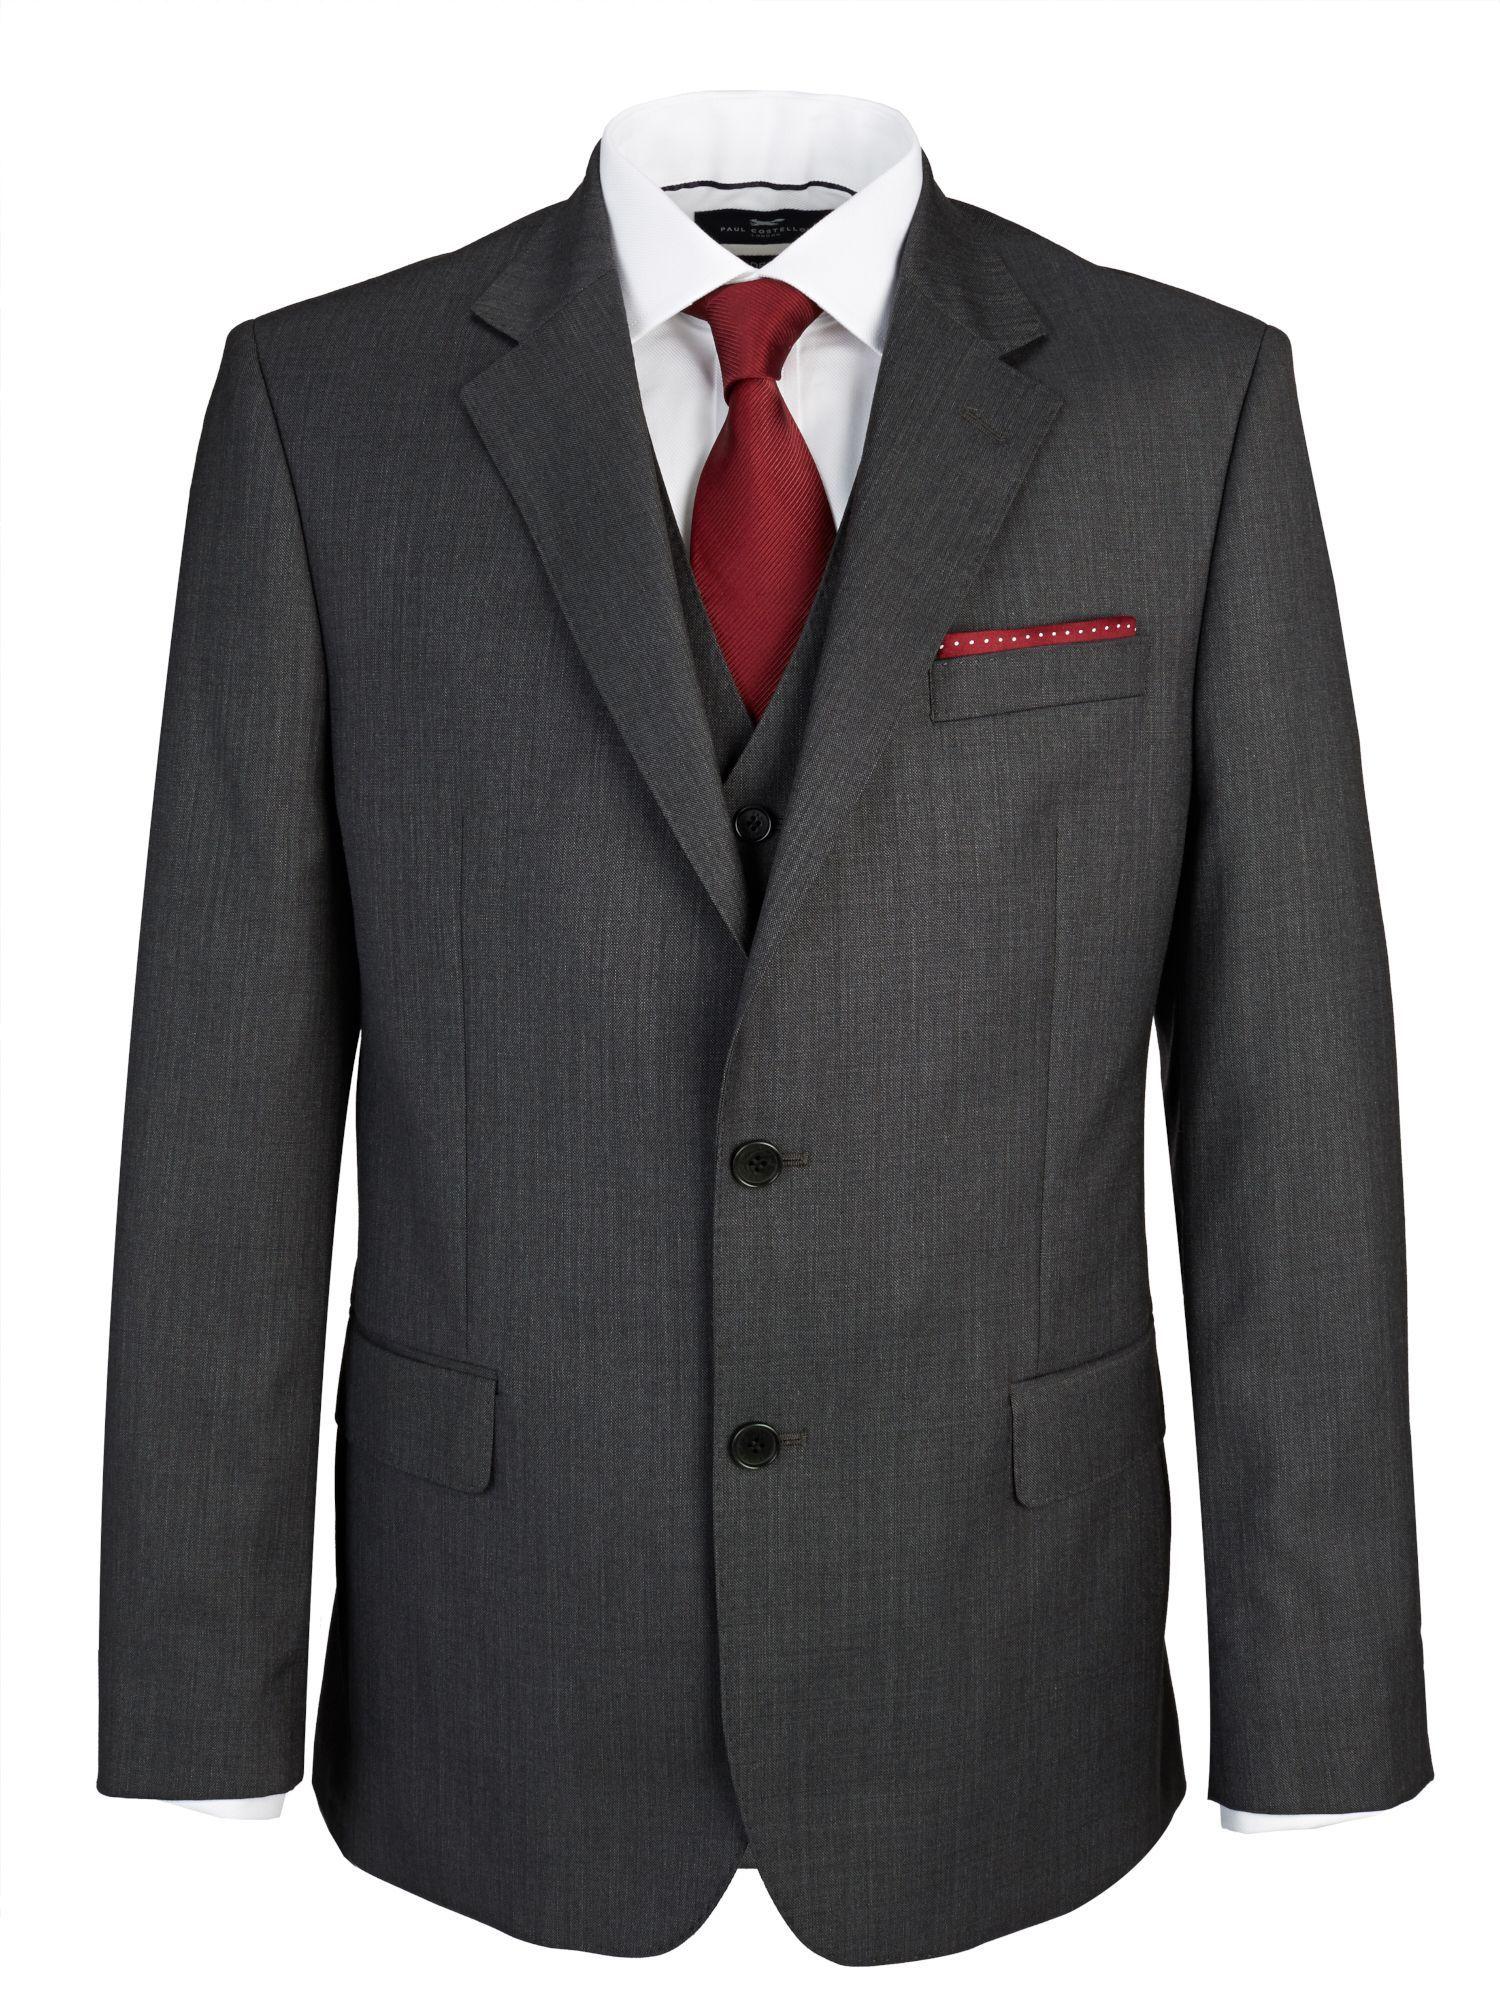 29fec160181c Buy: Men's Paul Costelloe Edgeware Wool Pick & Pick Suit Jacket,  Charcoal for